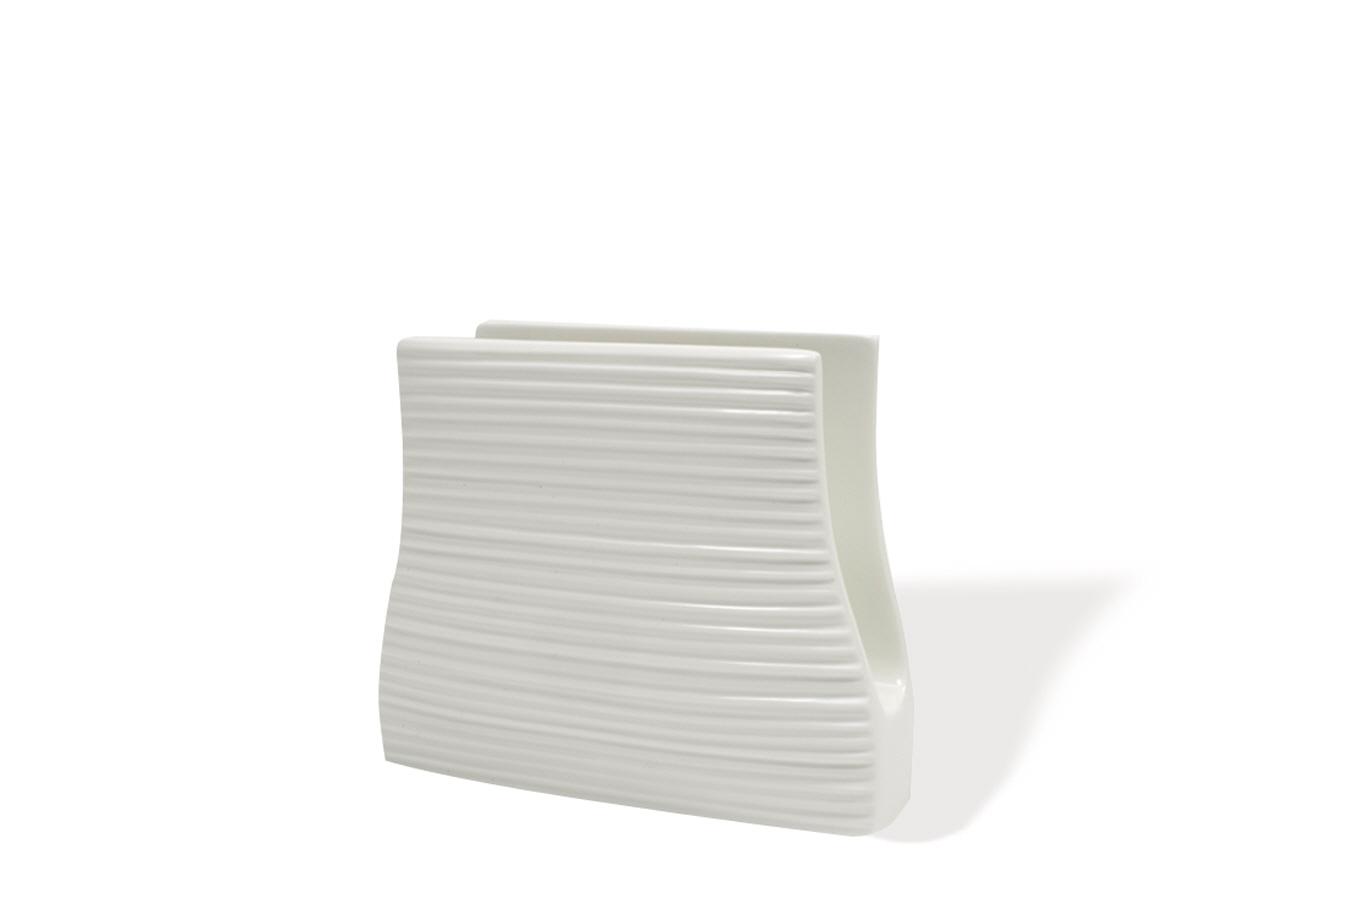 Stojan na ubrousky White Basics Cirque 13,5 x 12,5 cm - Maxwell&Williams